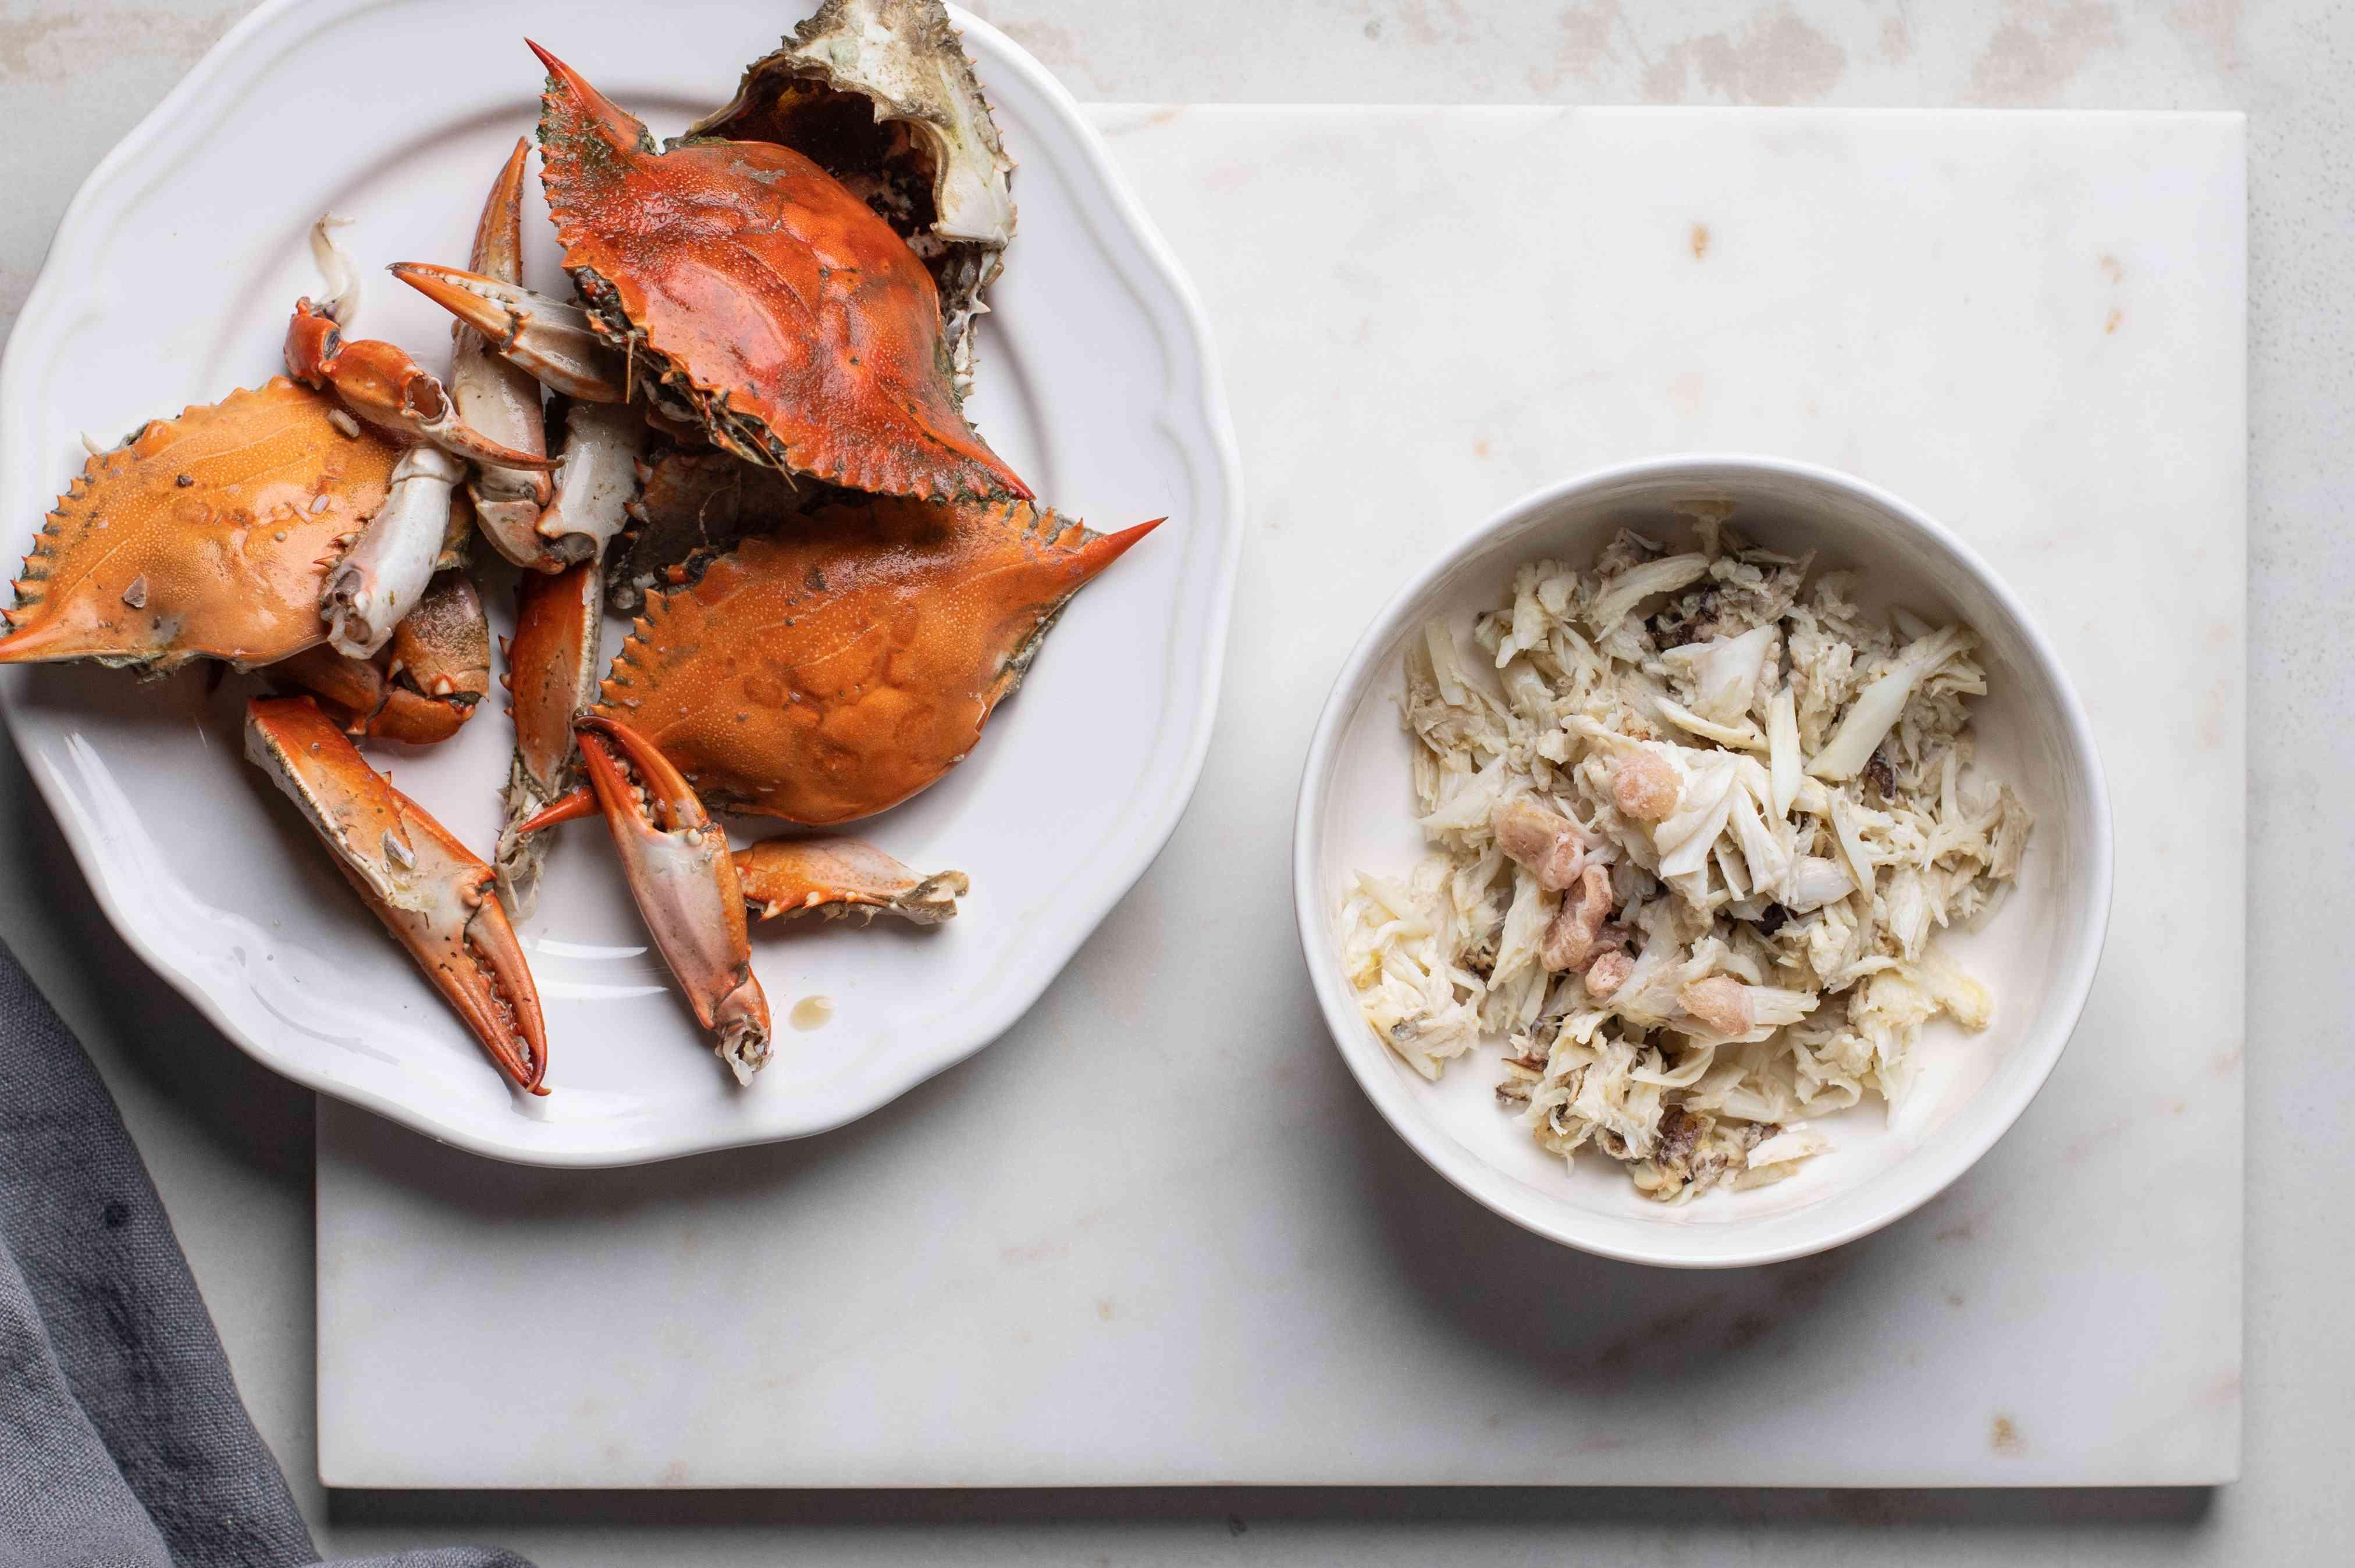 Drain crabs